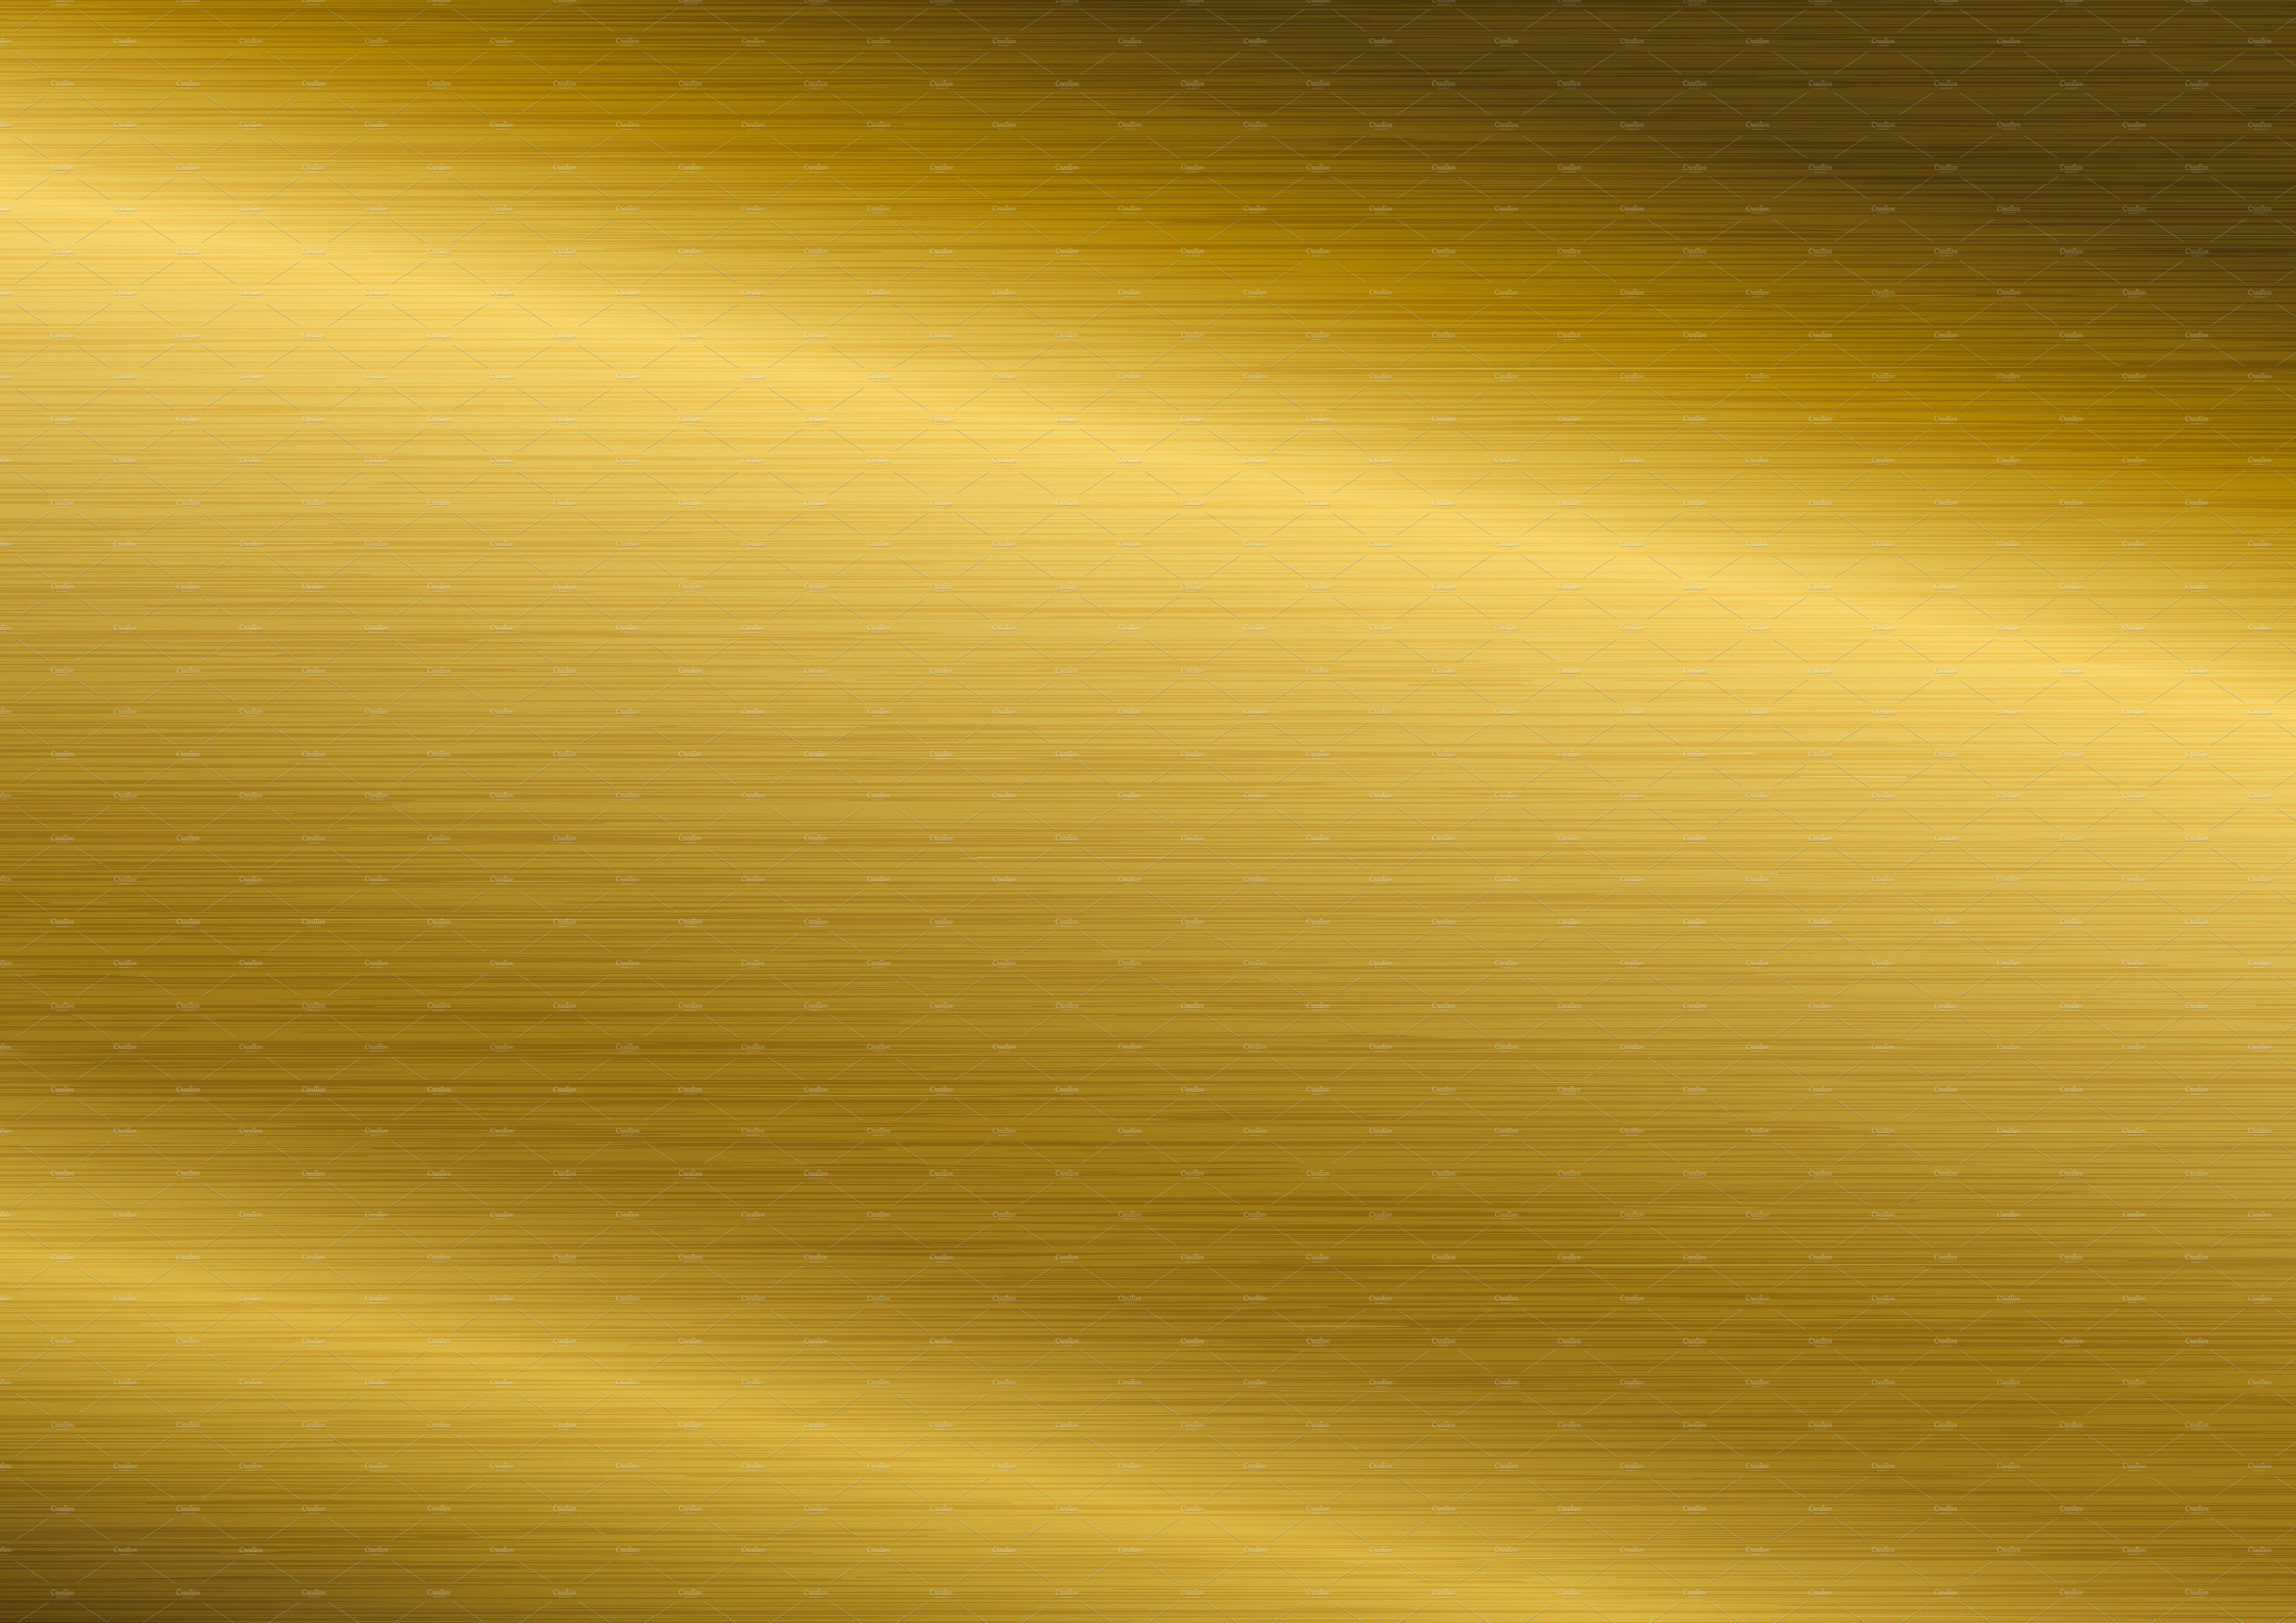 Gold Metal Background Illustrations Creative Market